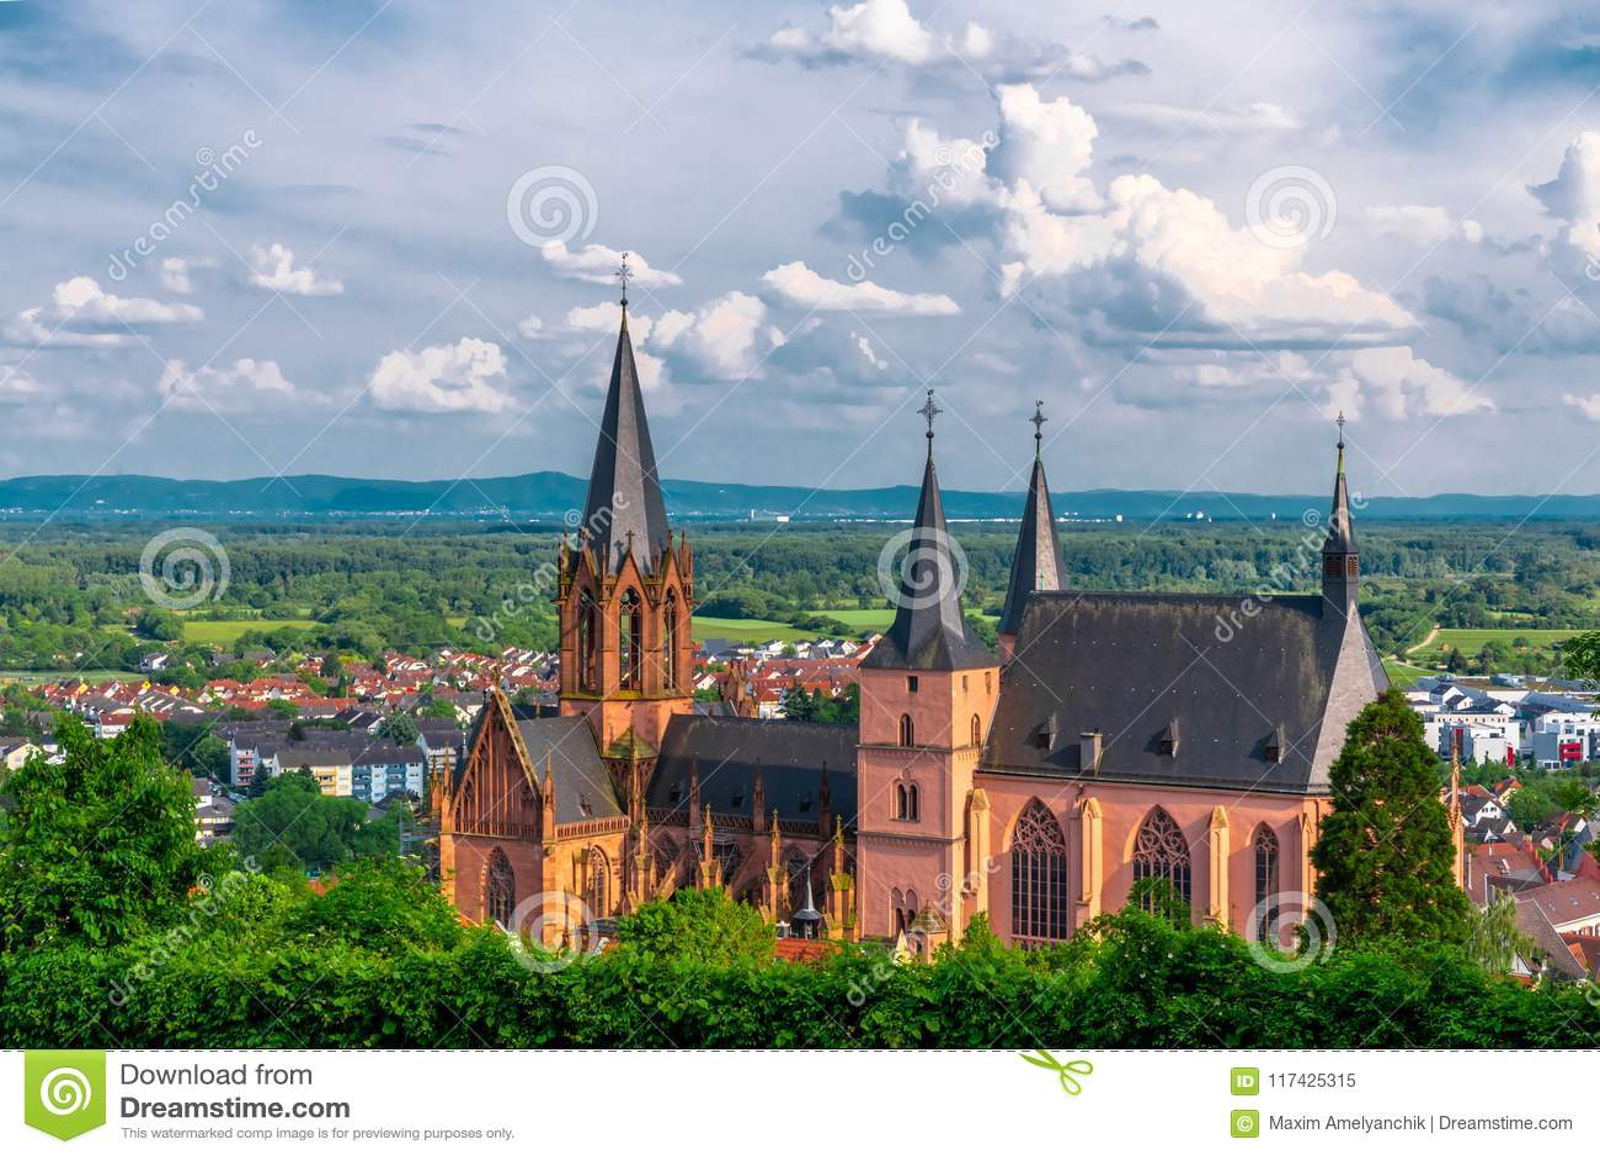 Church in Oppenheim, Germany